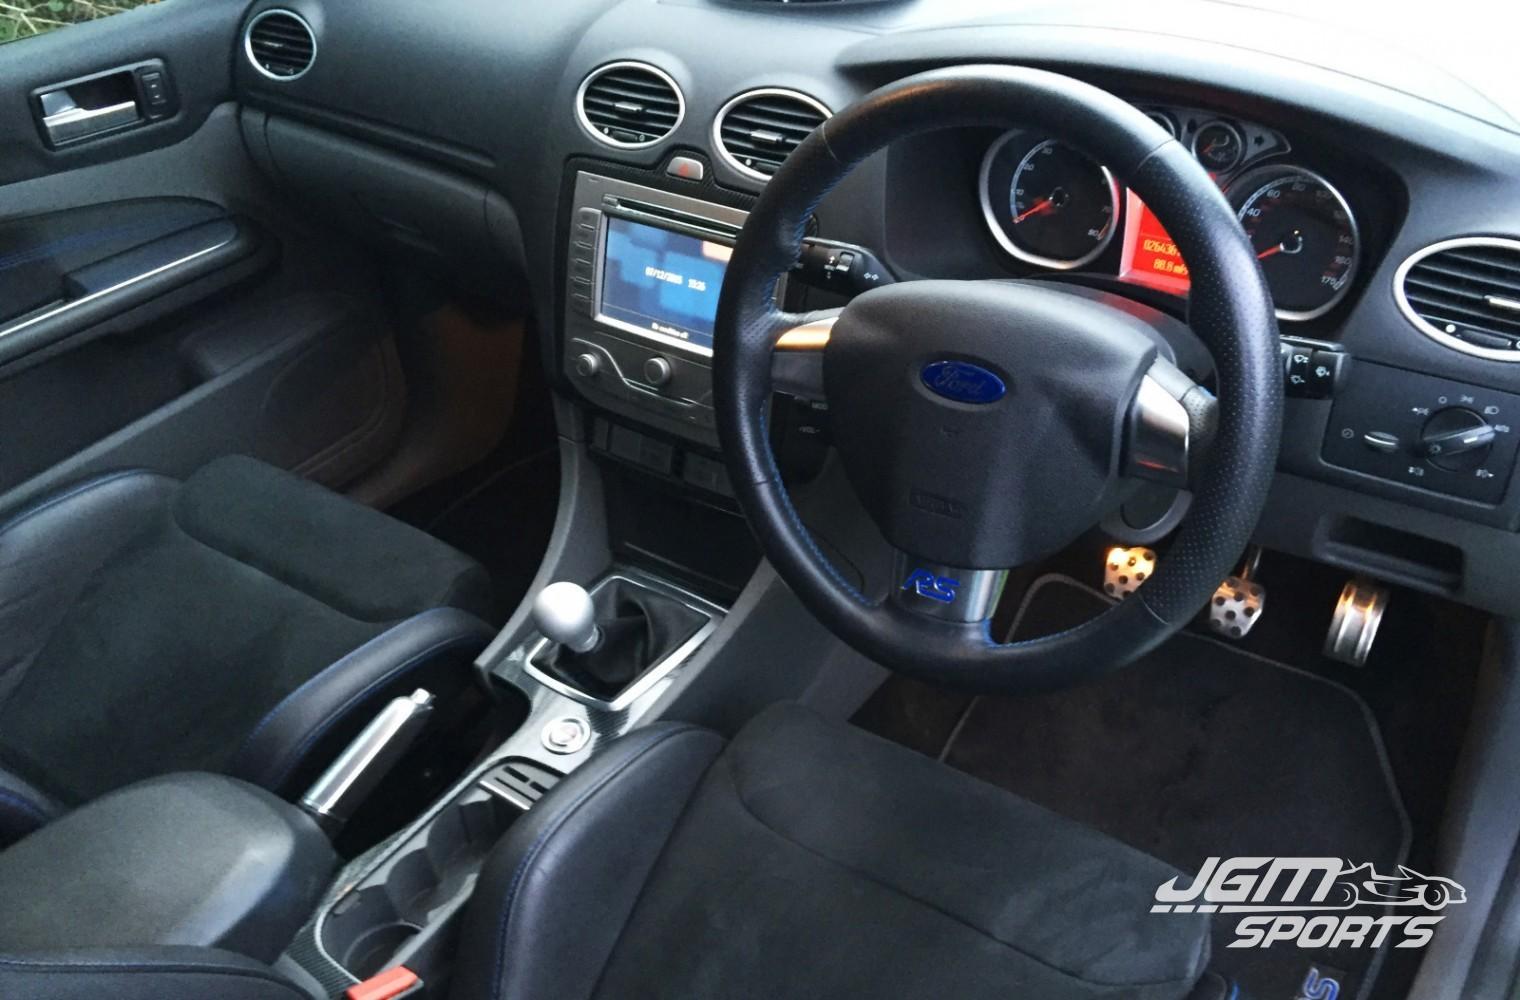 2010 MK2 FORD FOCUS RS REVO REMAP 410BHP! › JGMsports